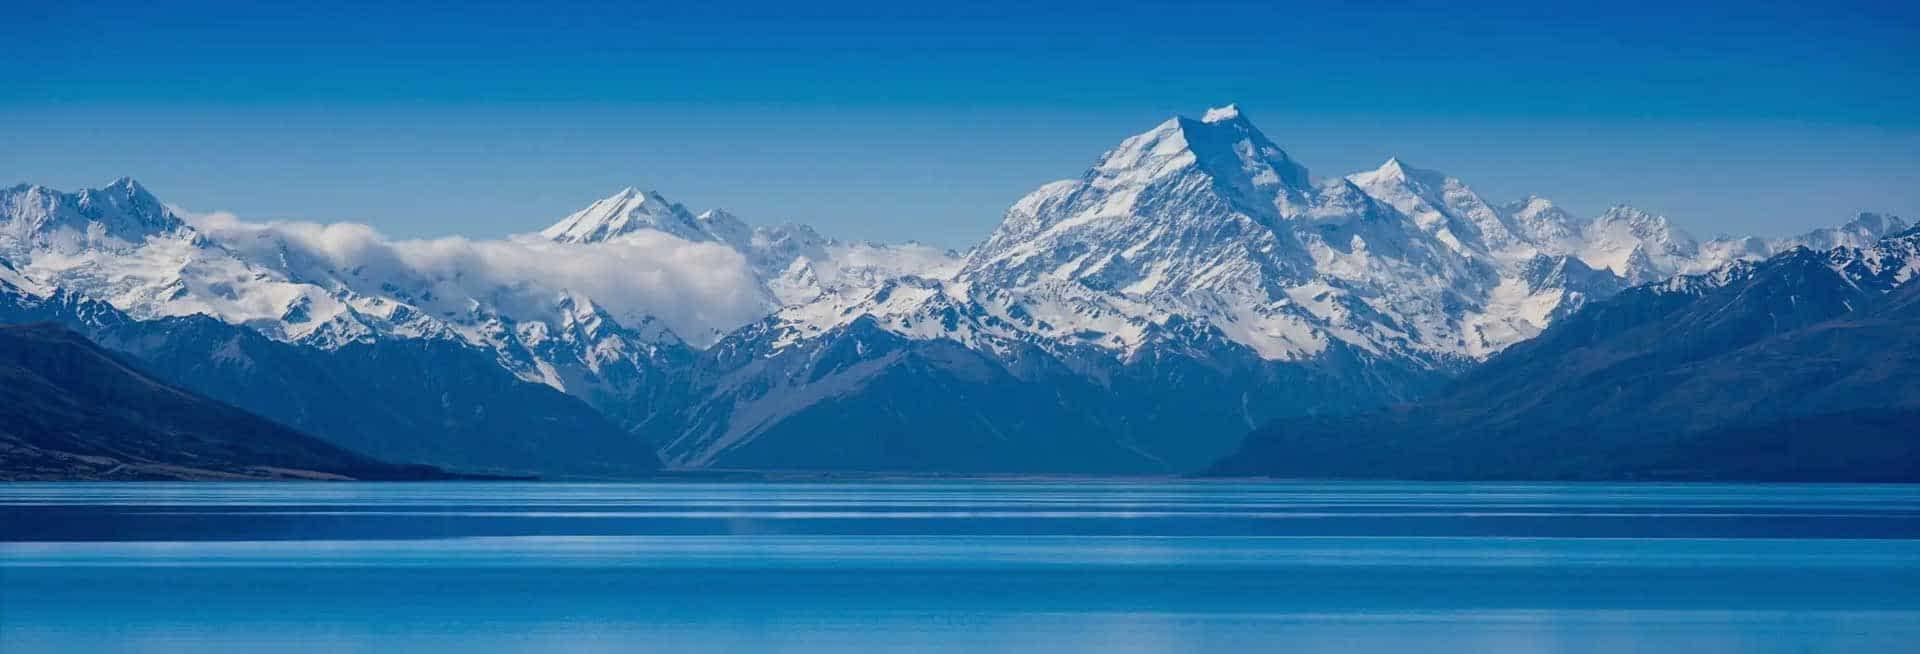 Umzug Neuseeland | Auswandern nach Neuseeland